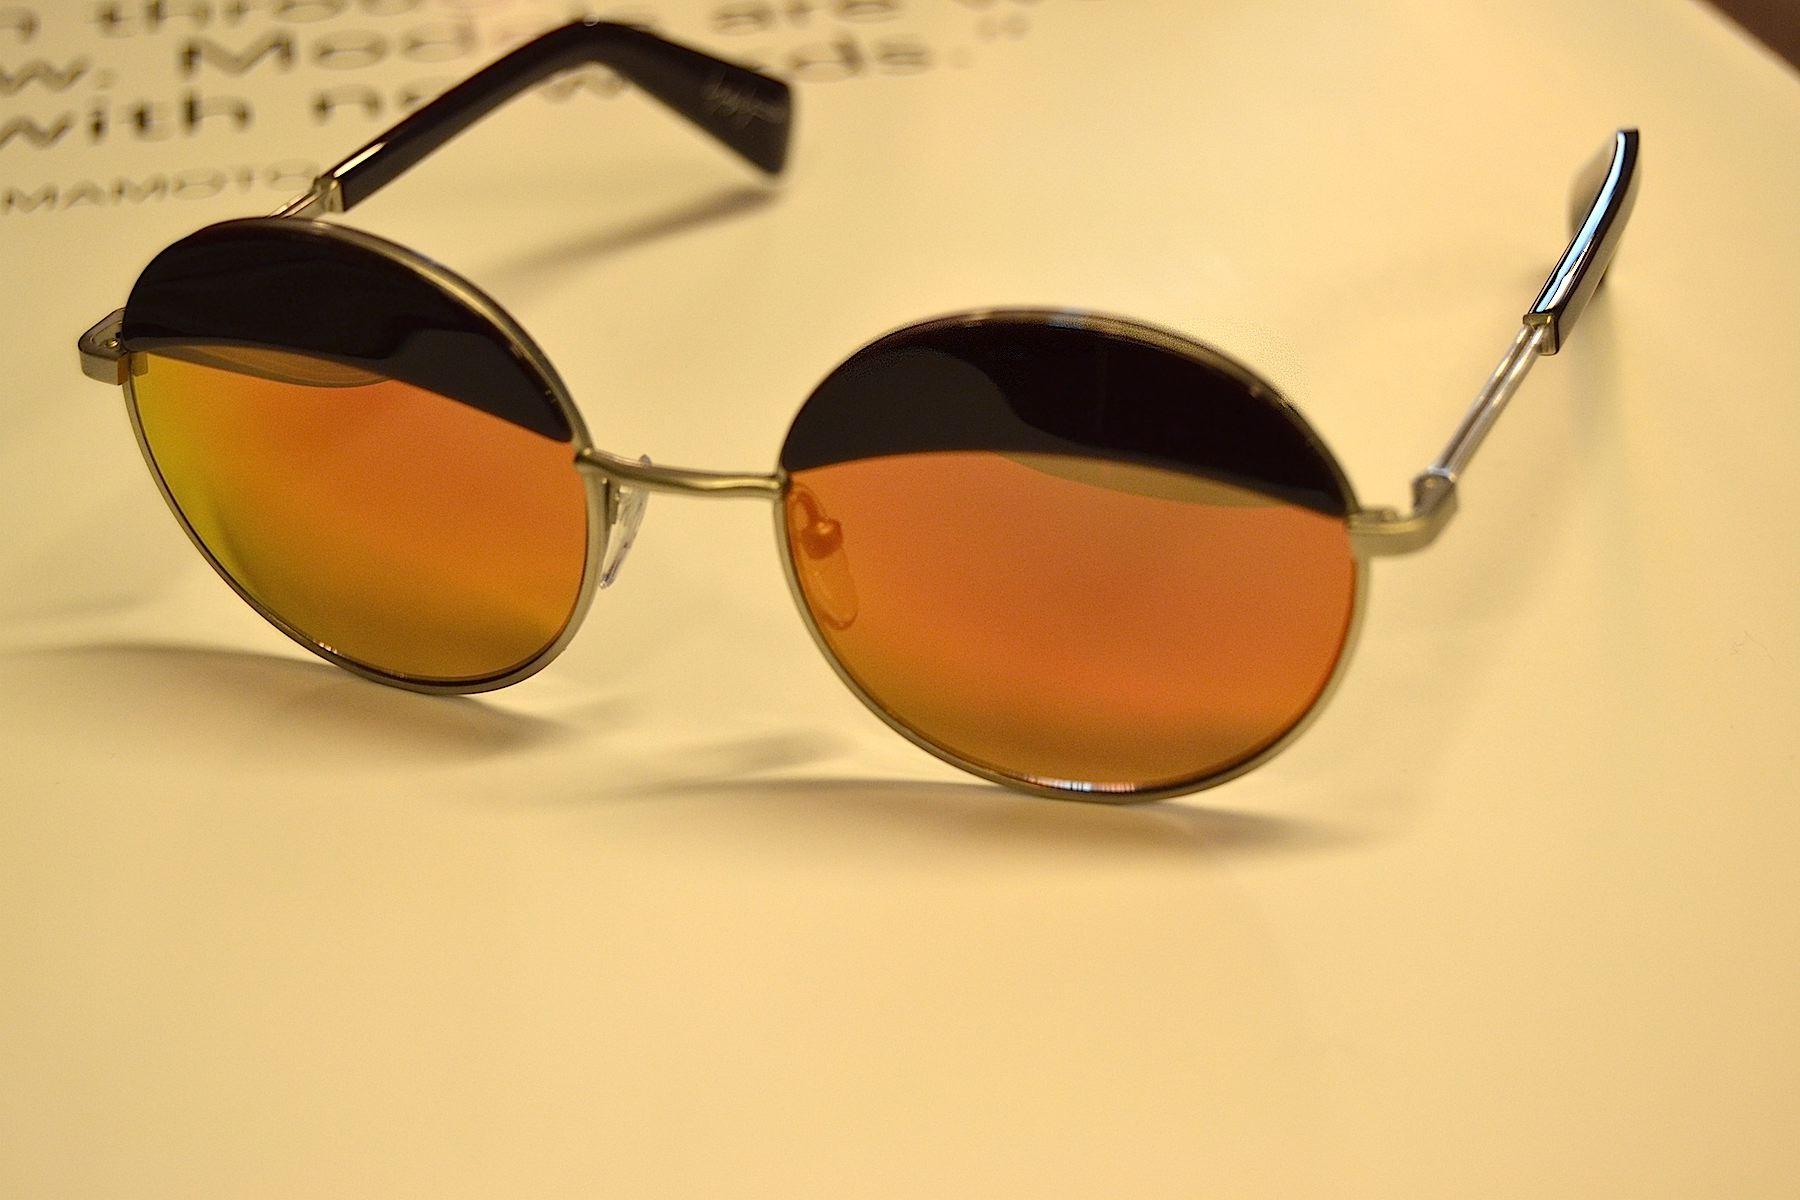 lenastore-bergamo-lenafashion-shop-online-yohji-yamamoto-gli-occhiali-sunglasses-1